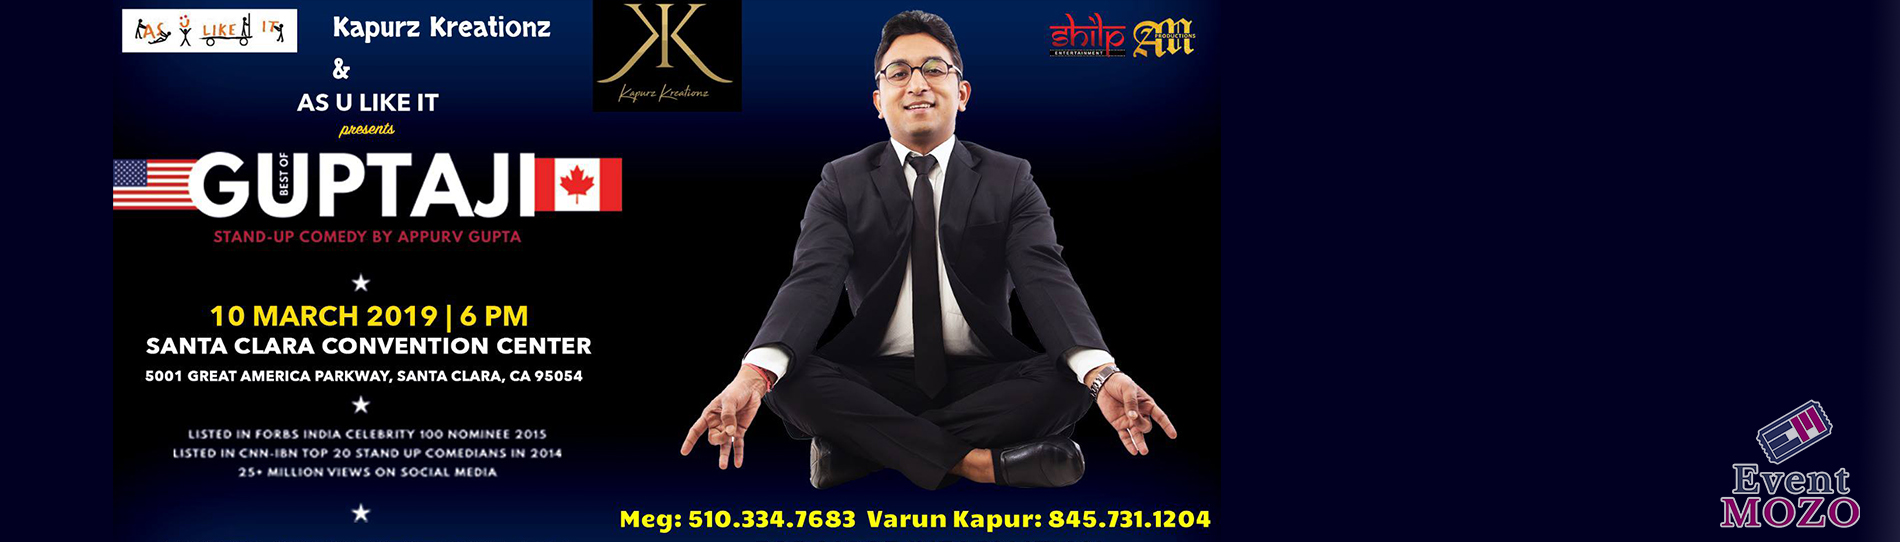 EventMozo Bay Area: Best of GuptaJi - Stand Up by Appurv Gupta